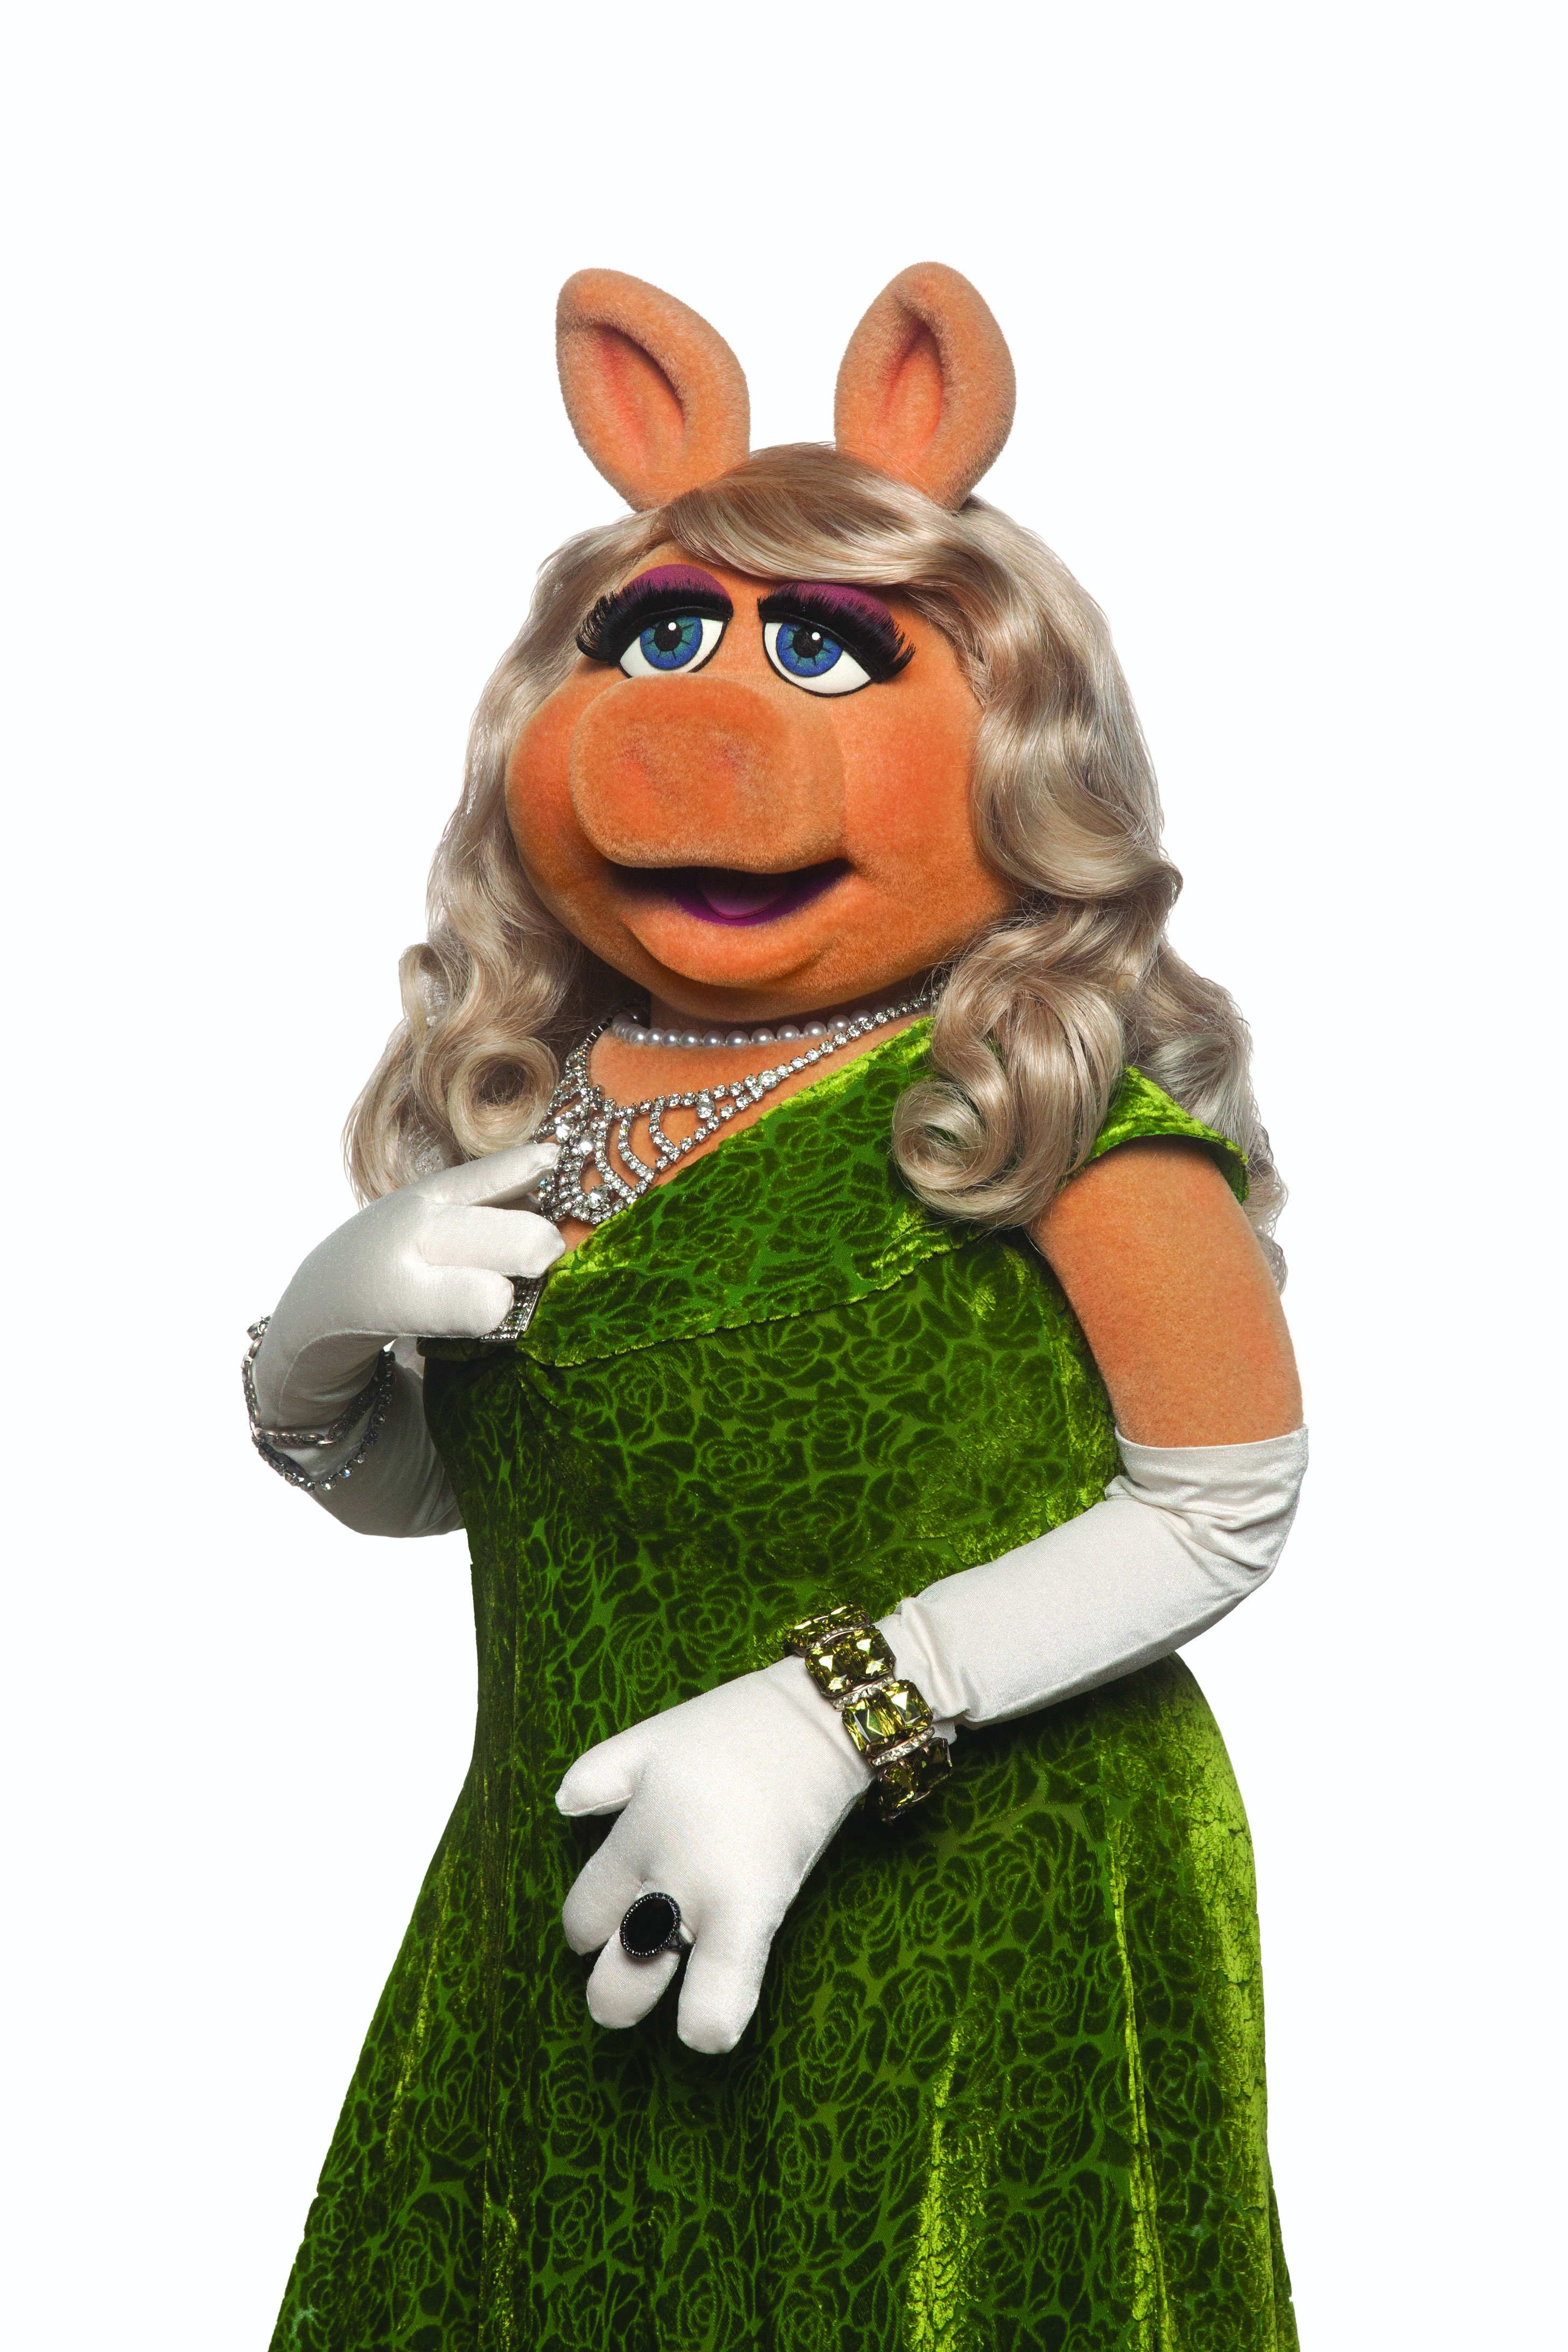 Grande ham Miss Piggy returns to theaters Friday Miss